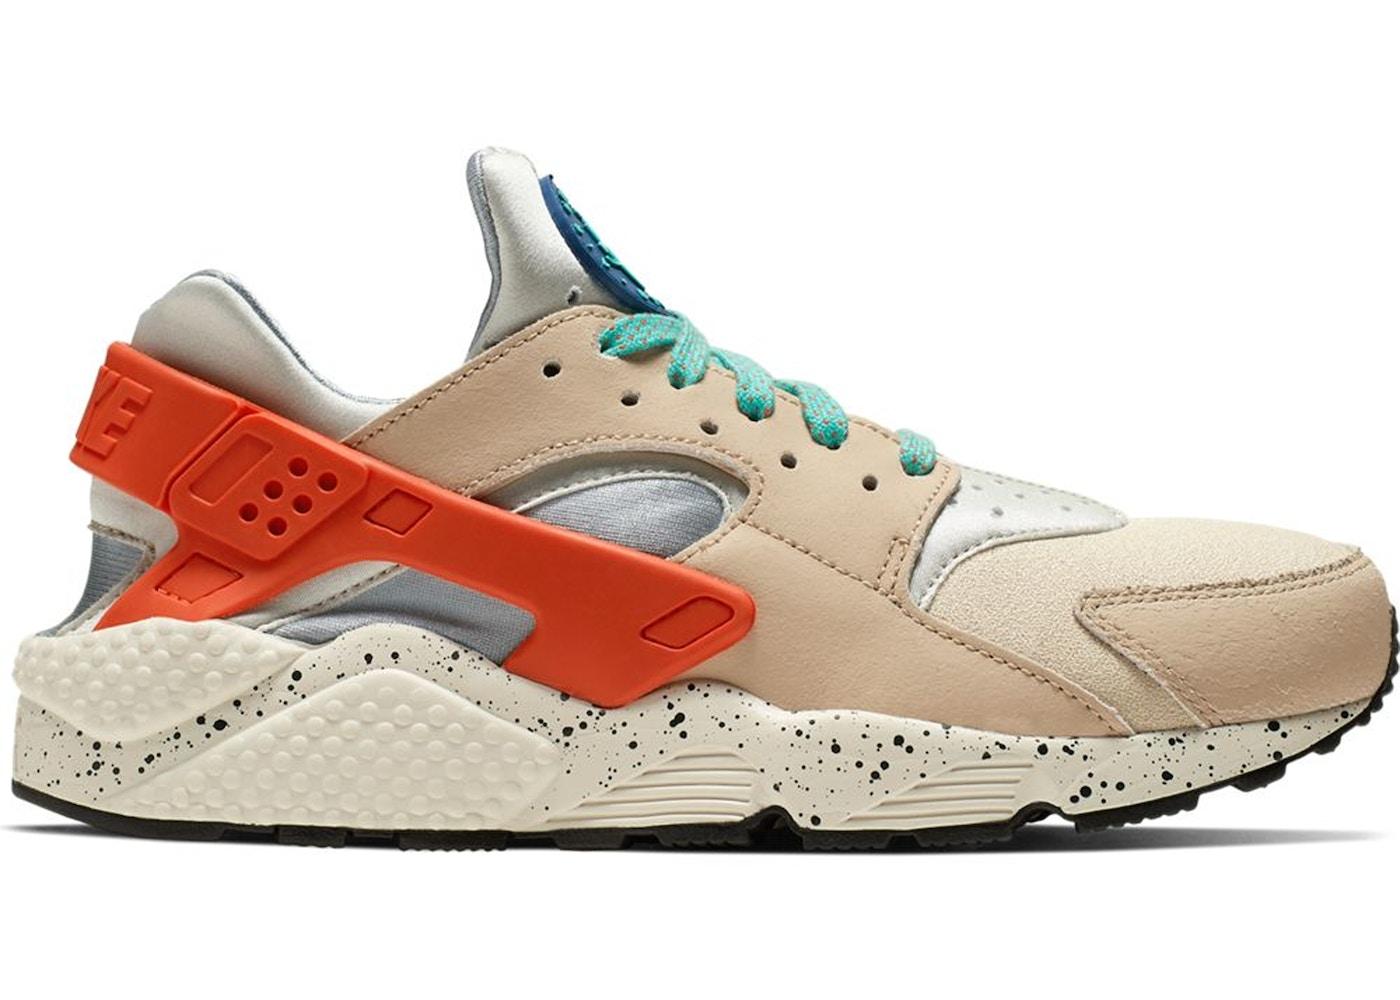 ritmo ella es Problema  Nike Air Huarache Run Desert Ore Hyper Jade - 704830-204